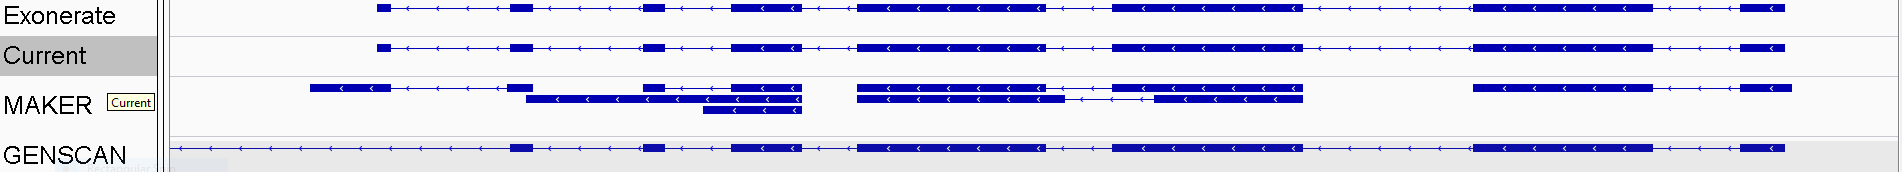 YF example 2